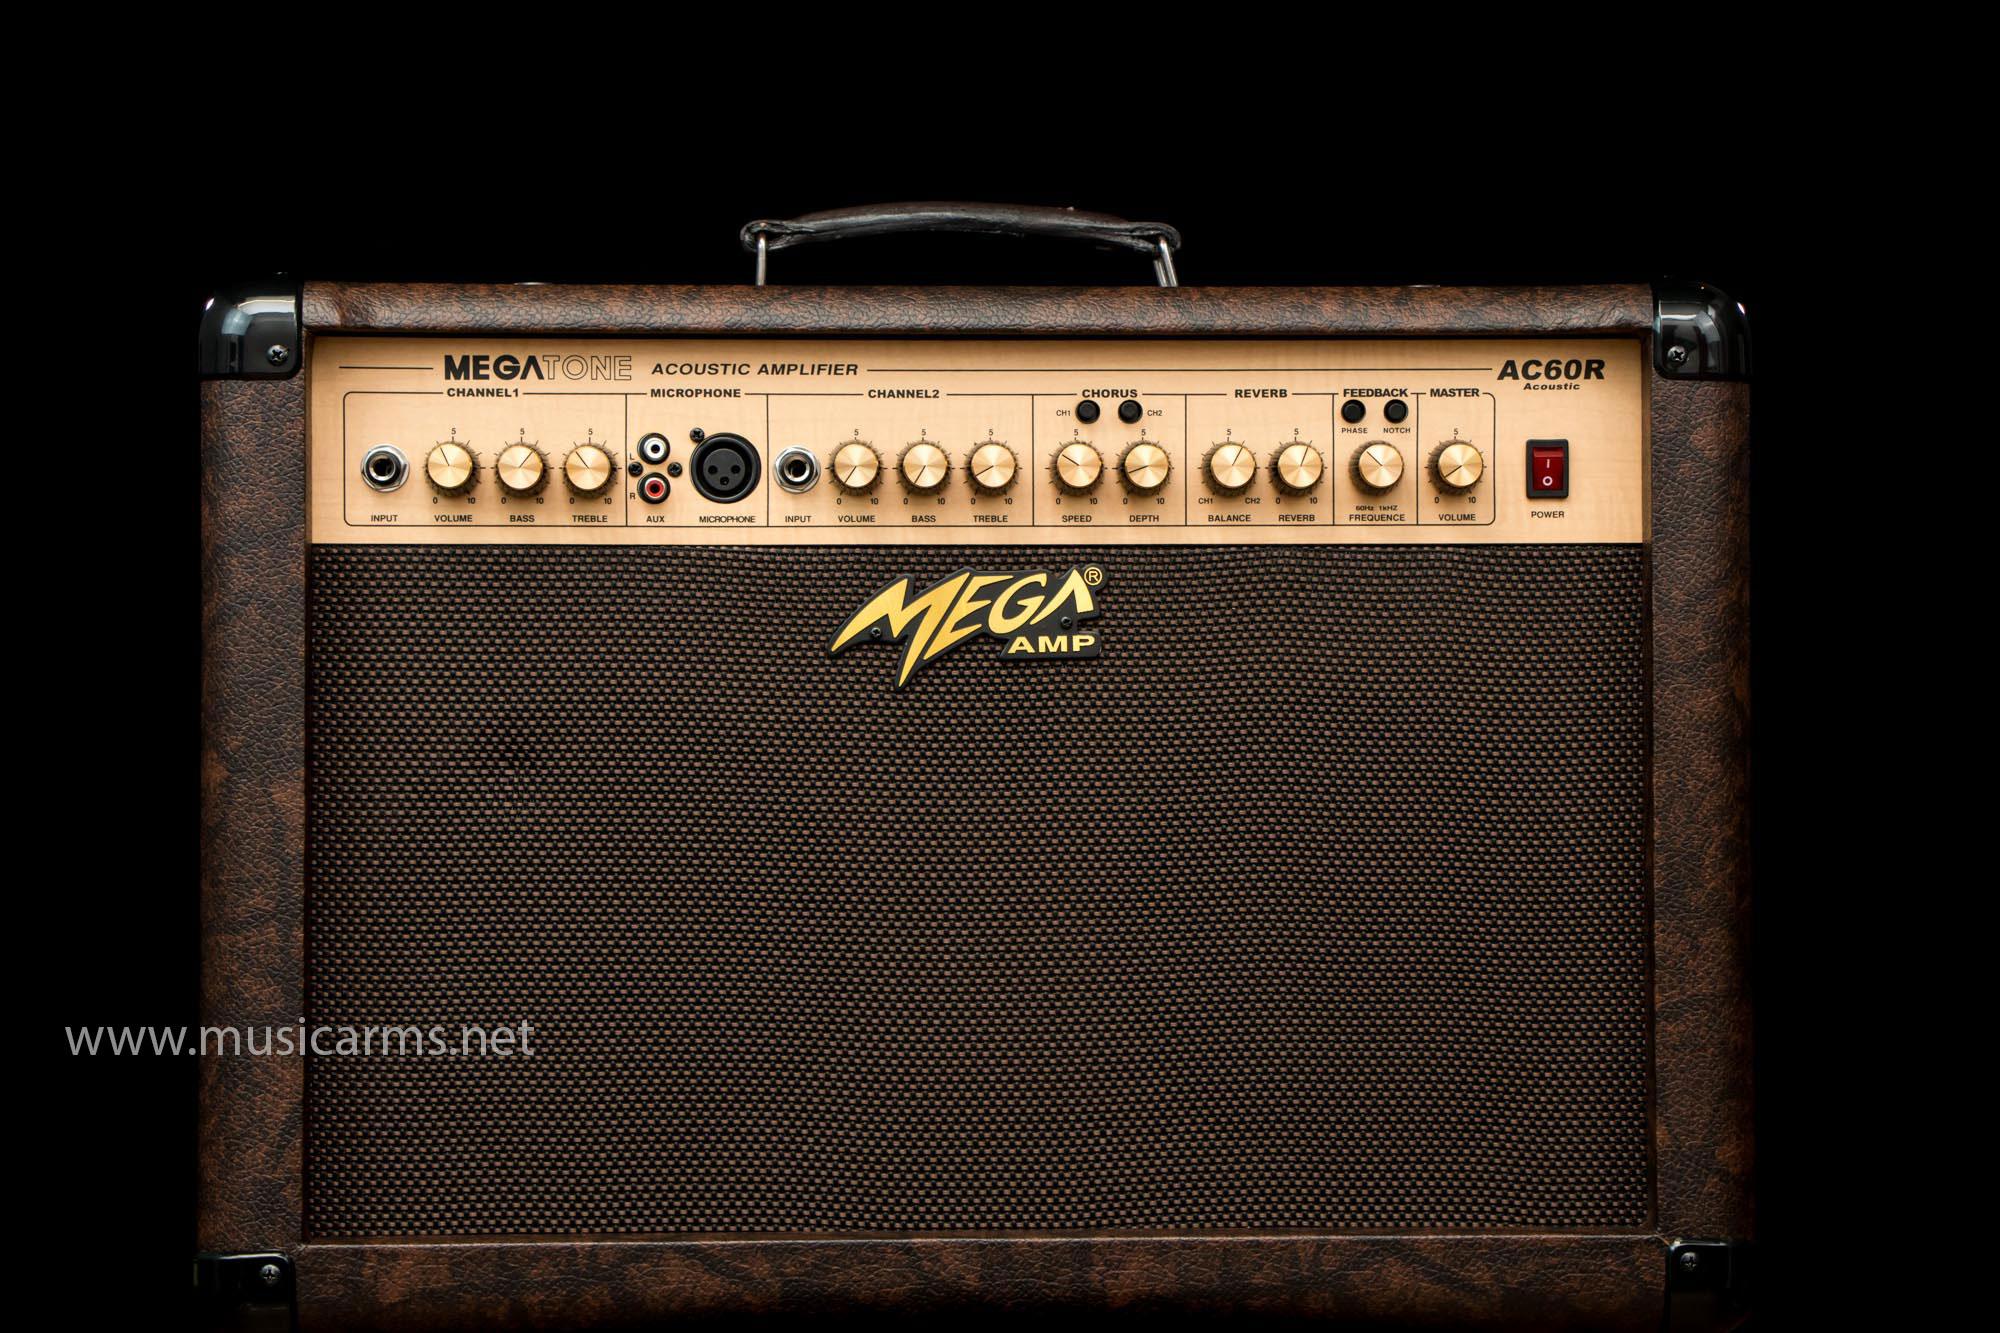 Mega Amp Acoustic AC60R